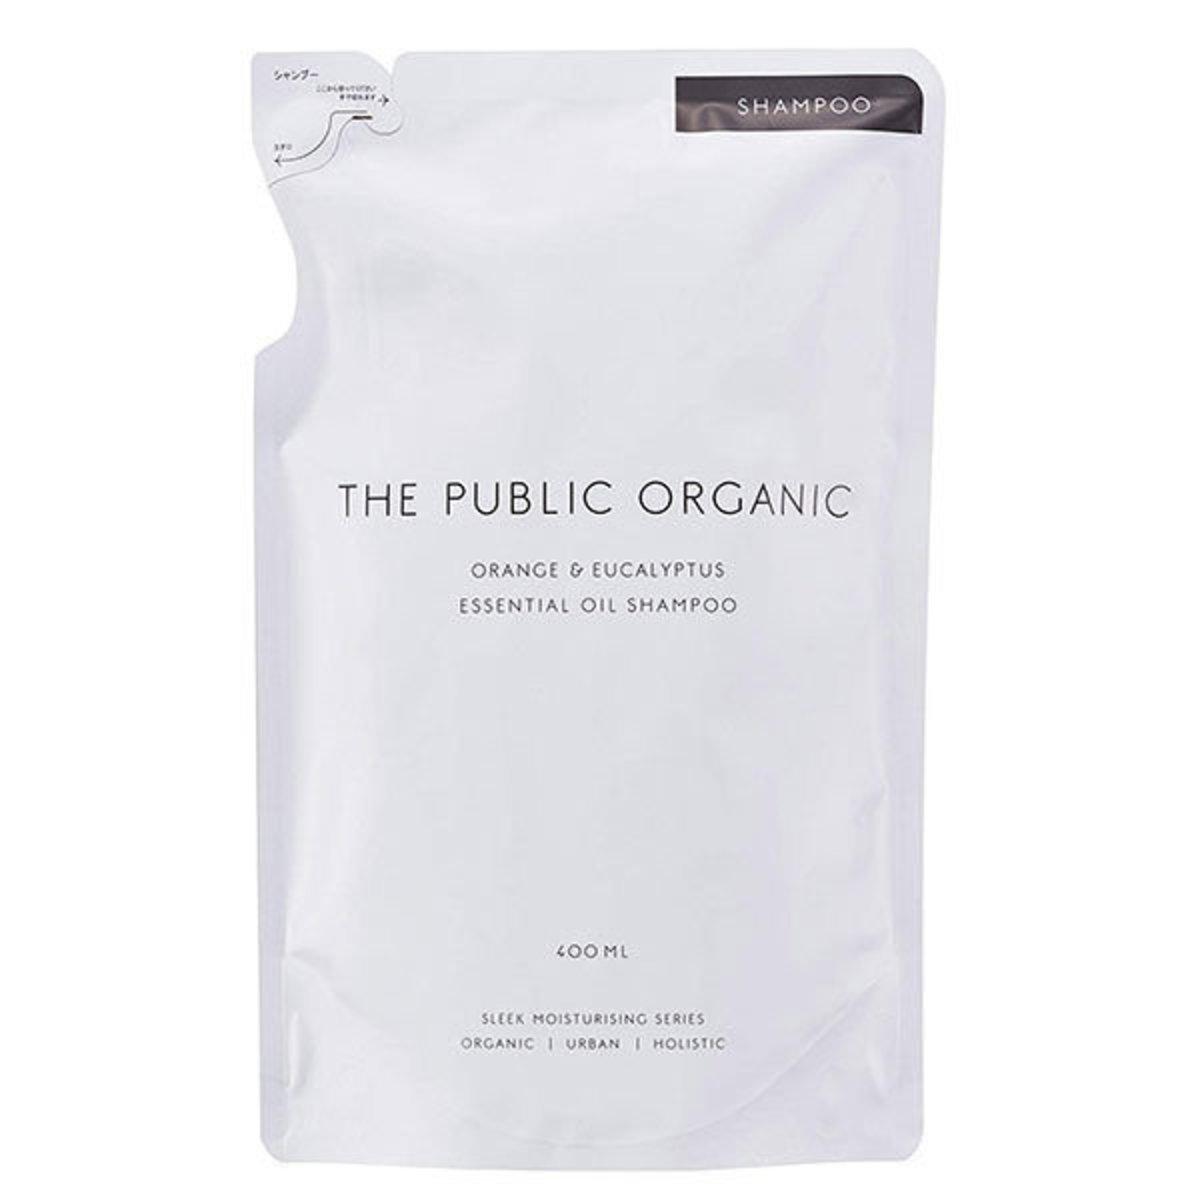 Orange & Eucalyptus Essential Oil Shampoo (Super Refresh)(Refill) 400ml (Parallel Imports Product)